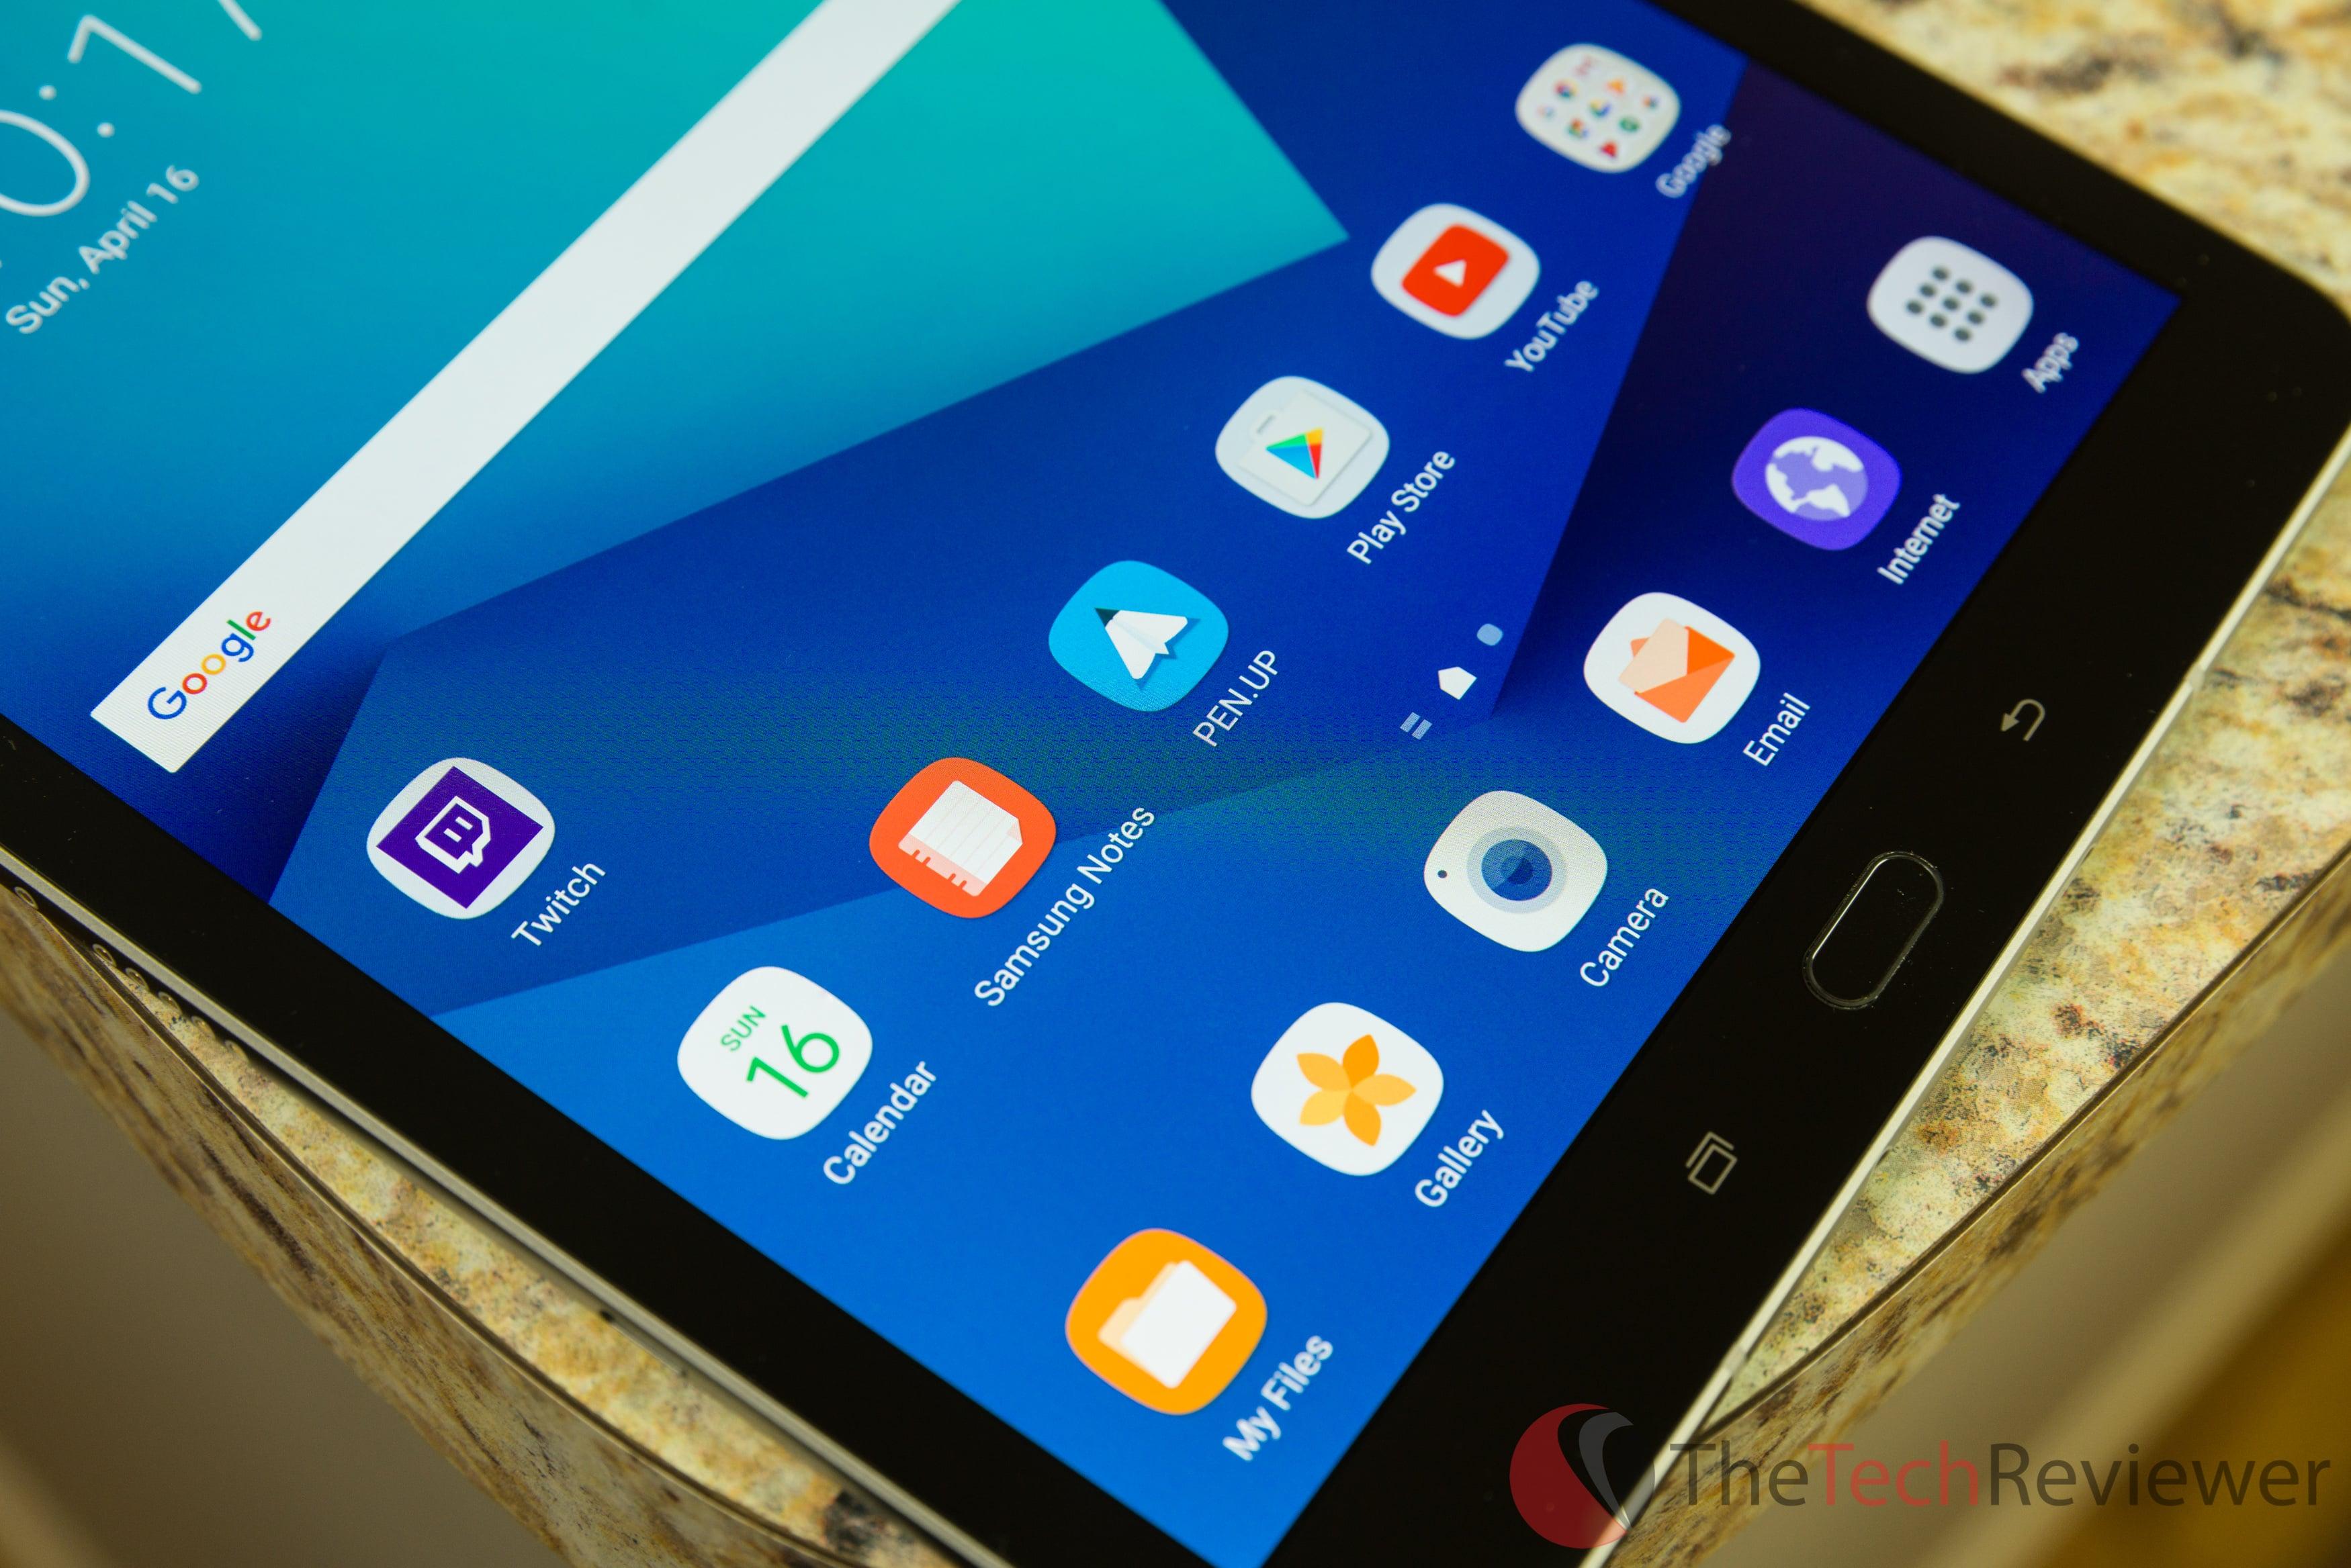 Samsung Galaxy Tab S3 3 of 3